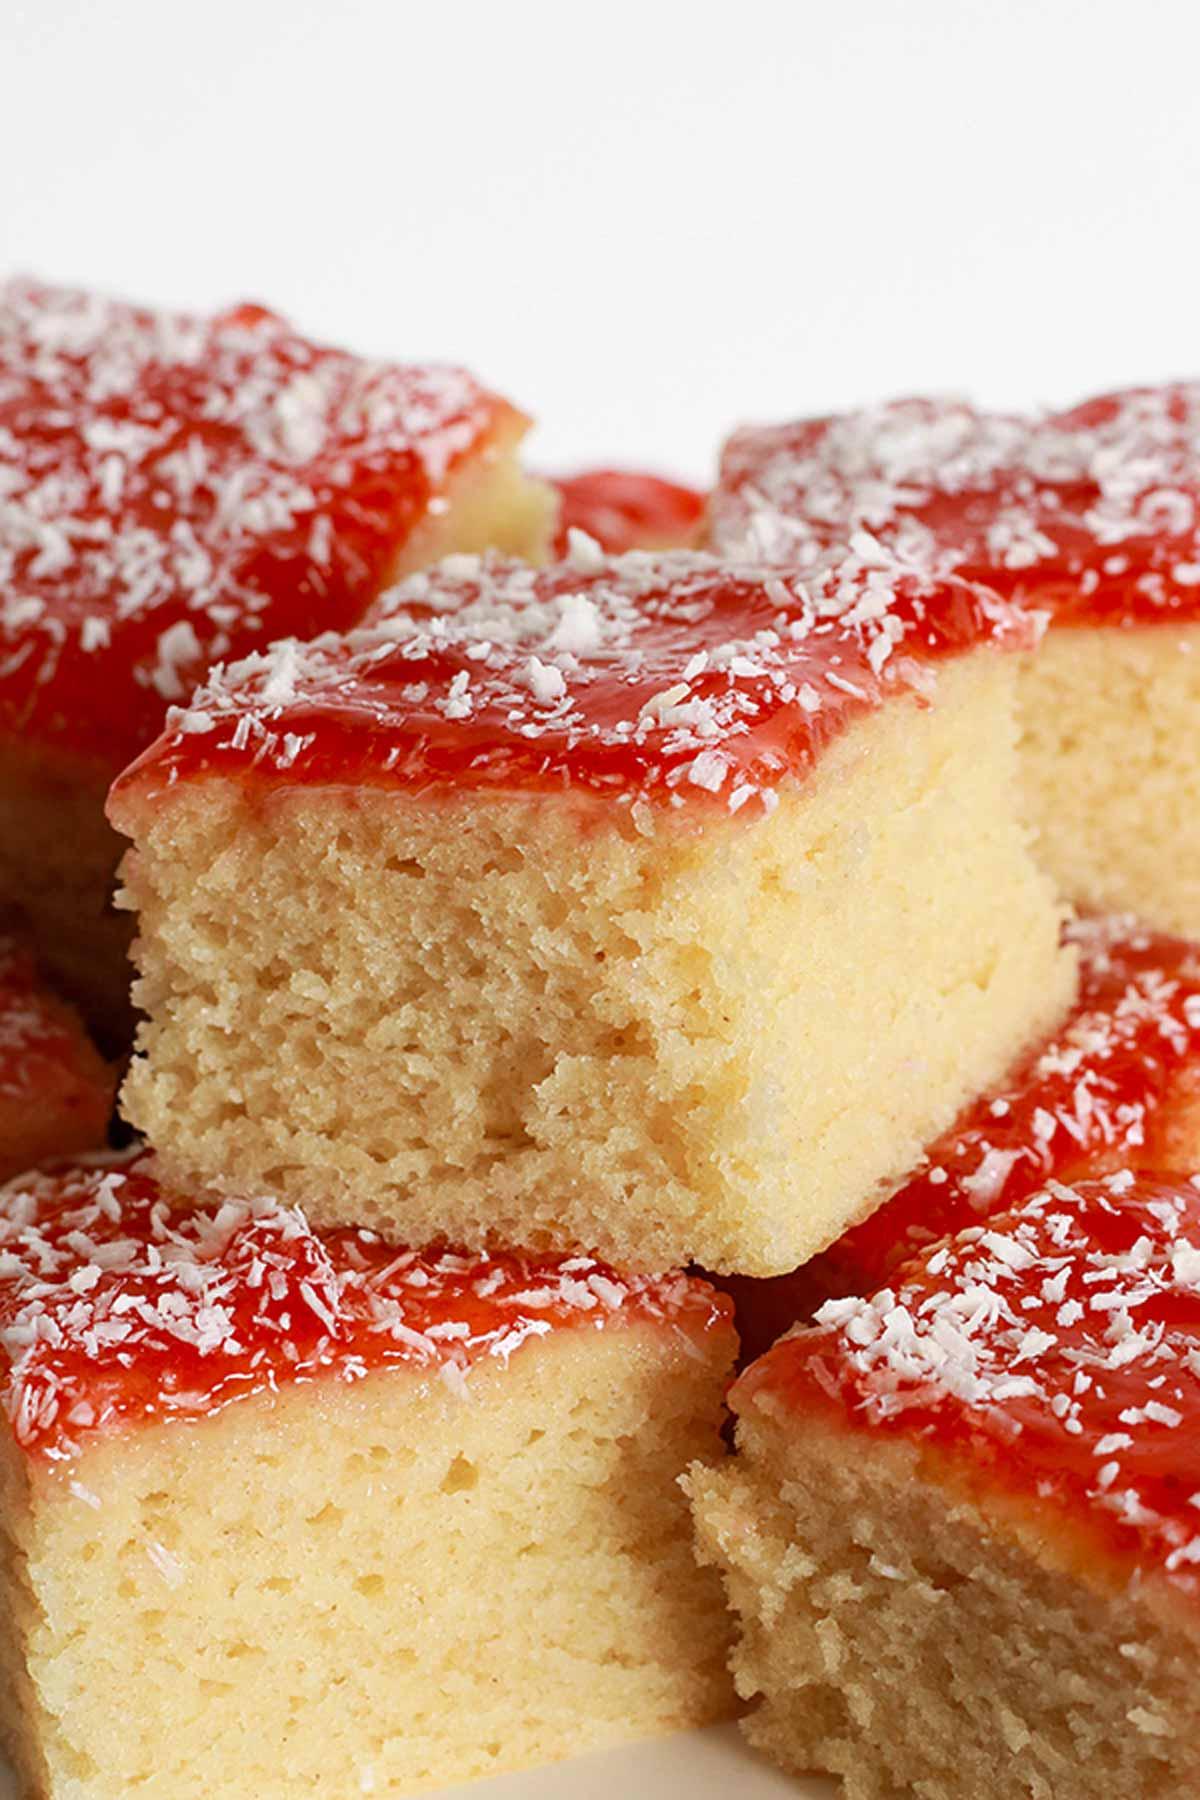 Square Slices Of Vegan Jam And Coconut Sponge